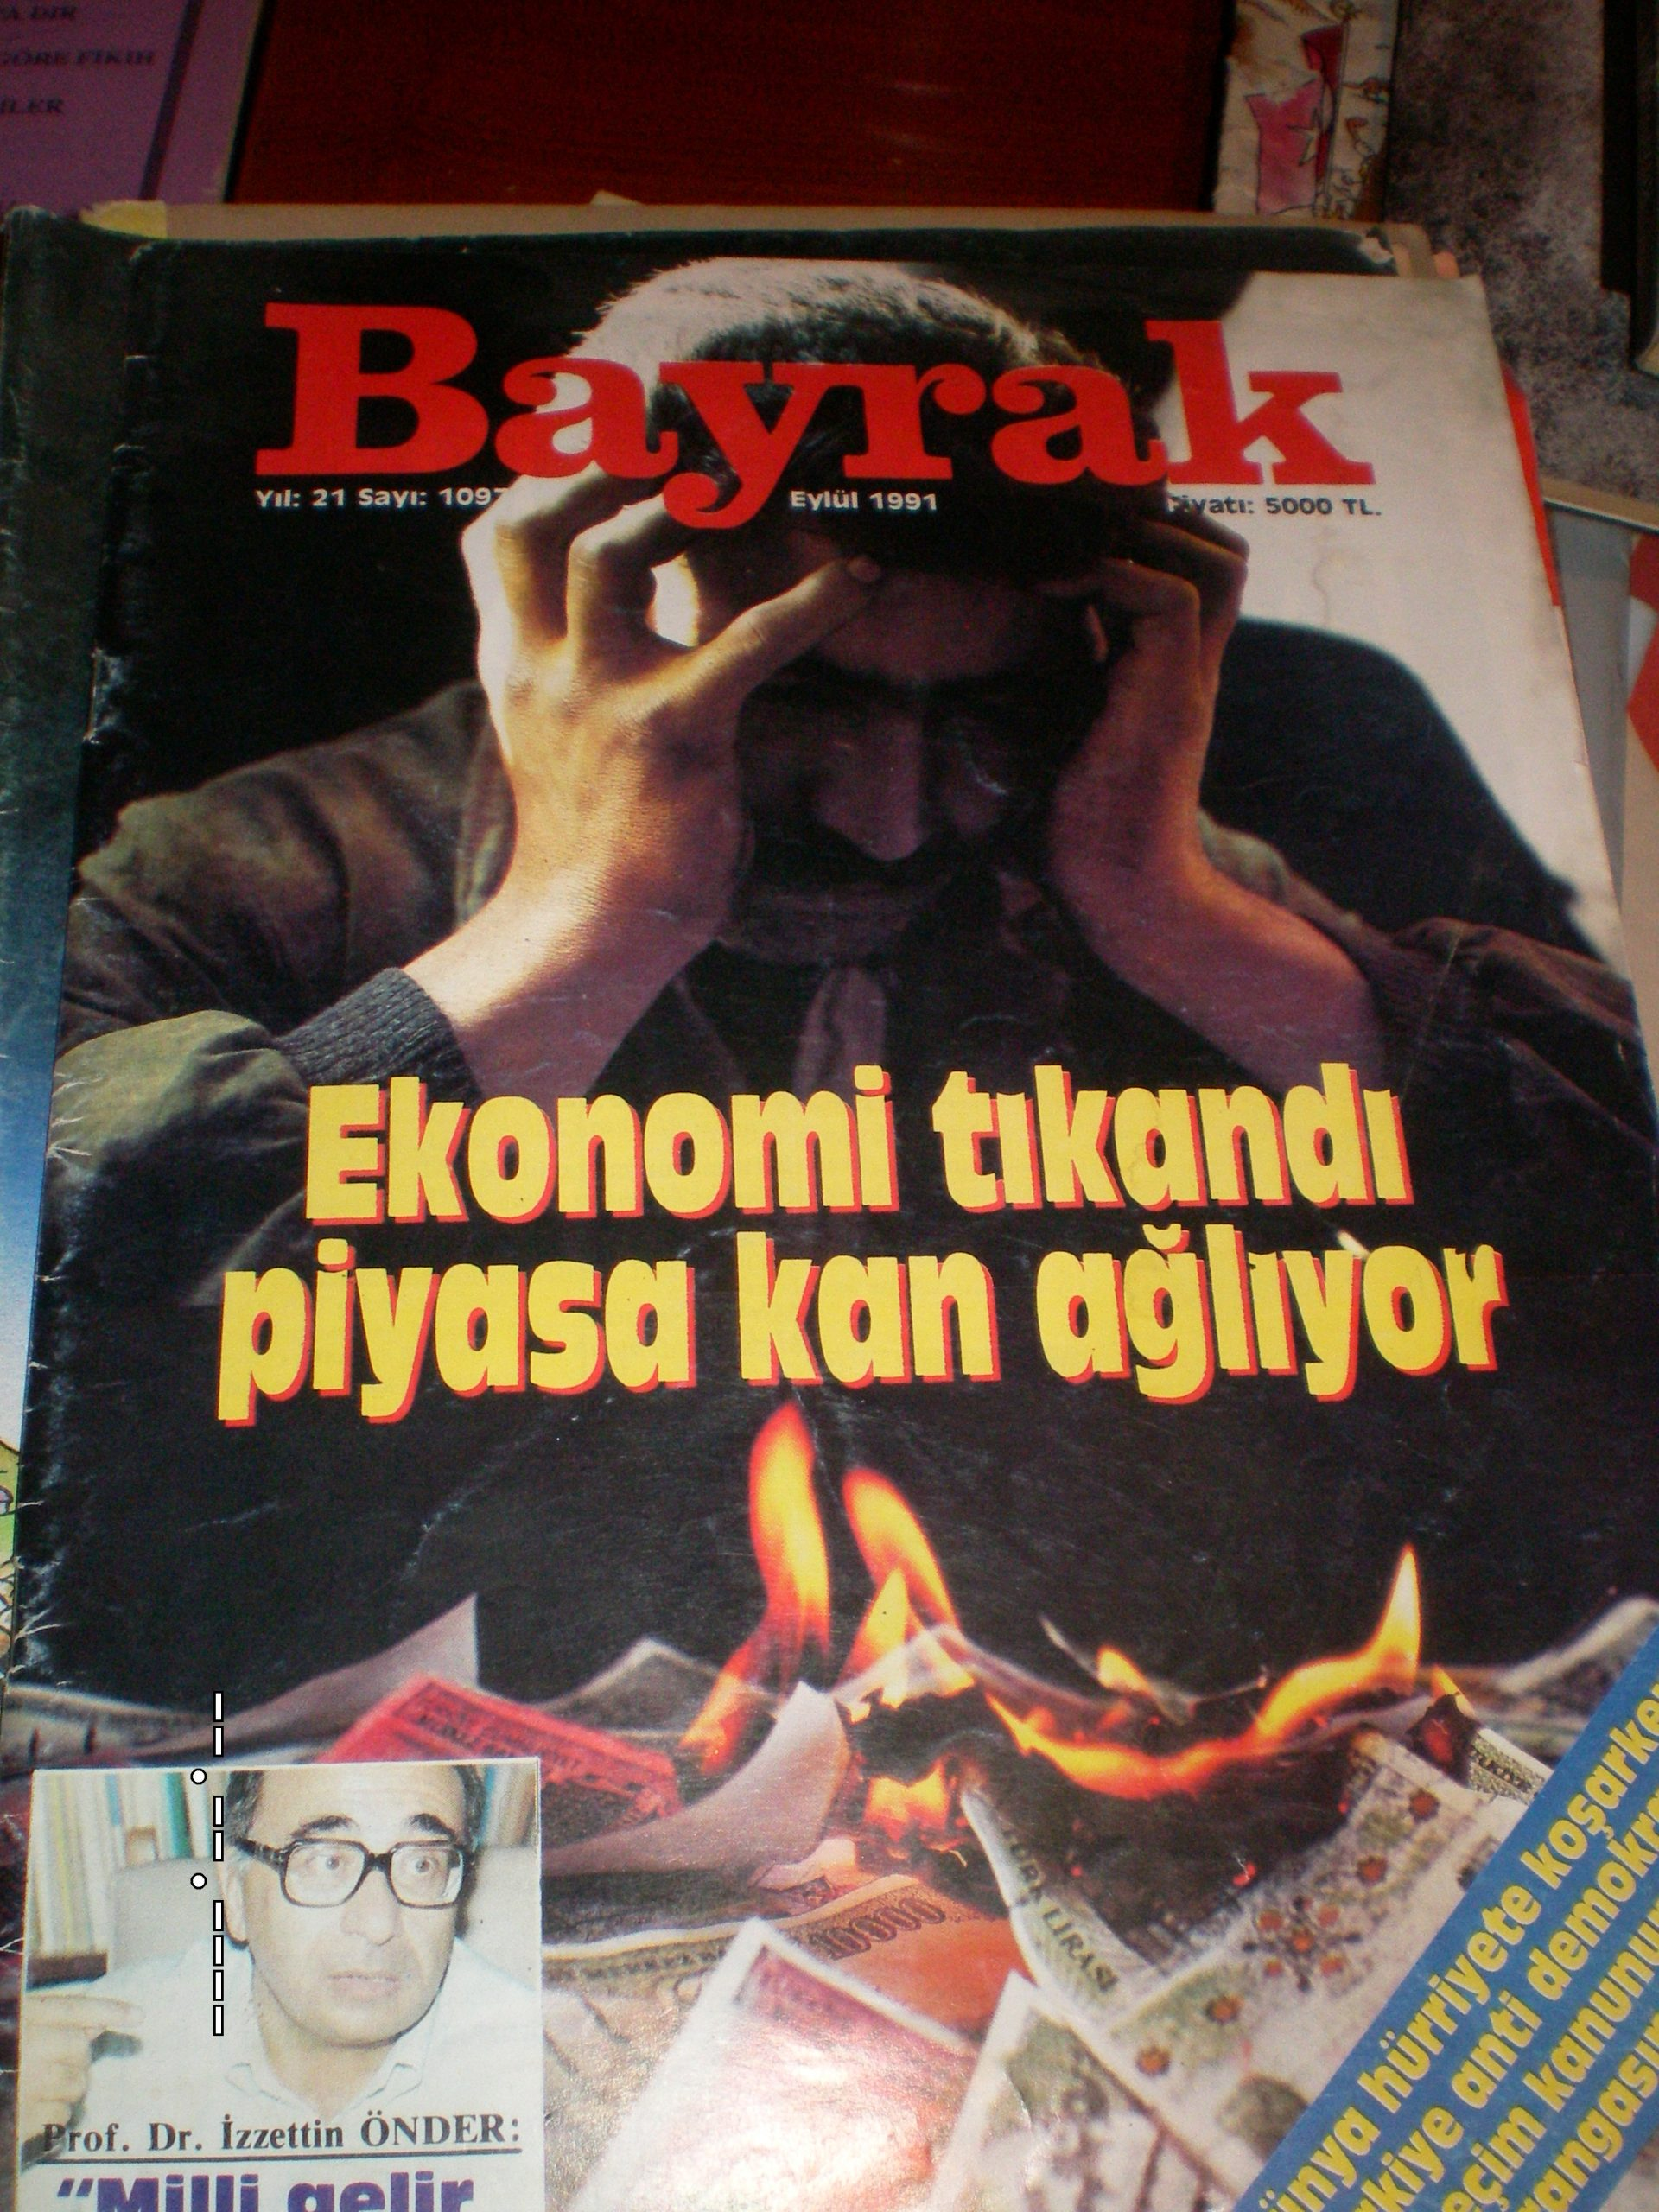 BAYRAK dergisi-sayı 1097,Eylül 1991/1 adet/ 5 tl